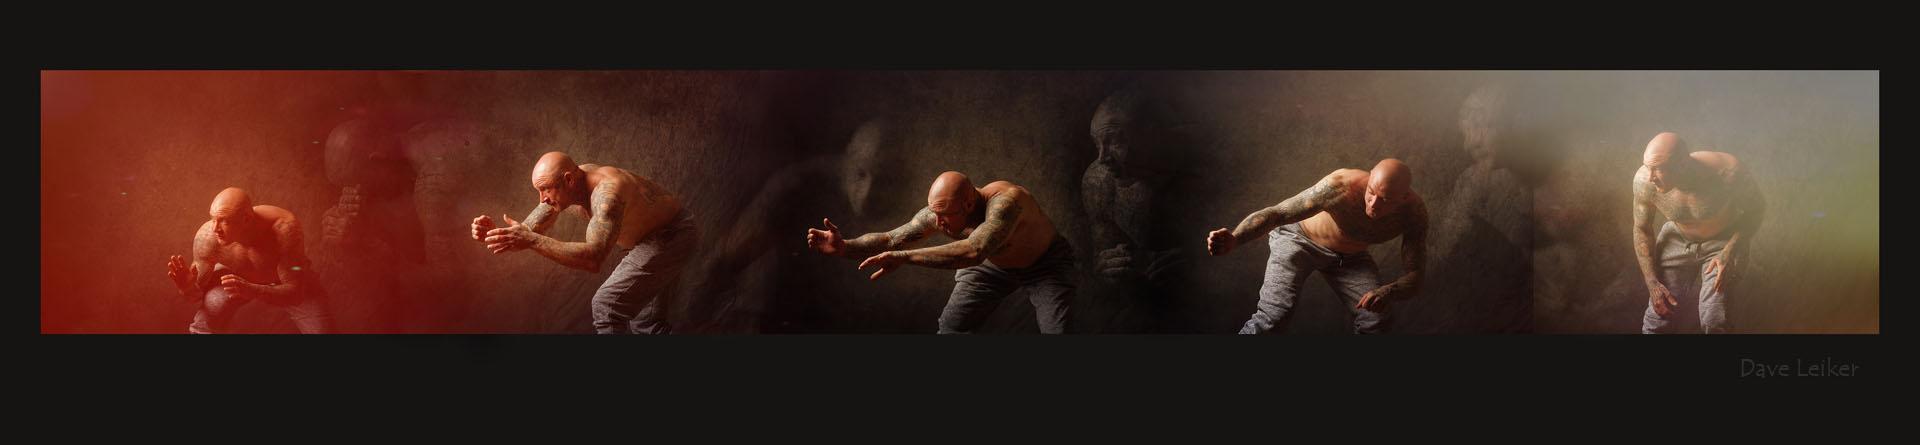 studies of martial arts moves